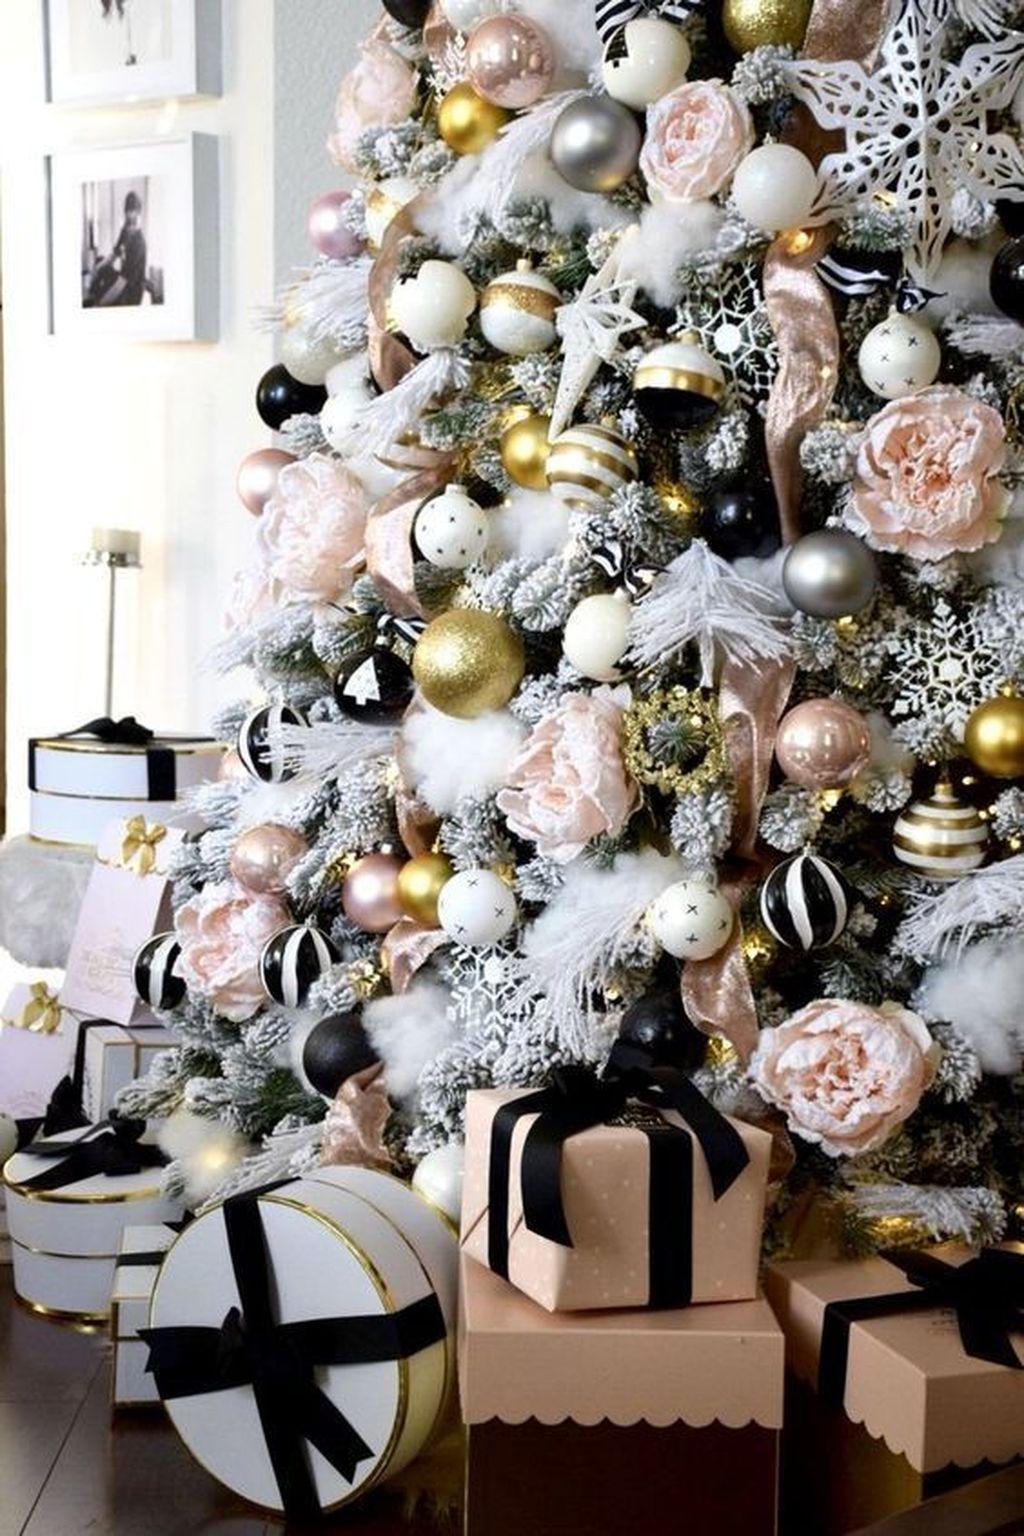 Amazing Winter Christmas Tree Design And Decor Ideas 18